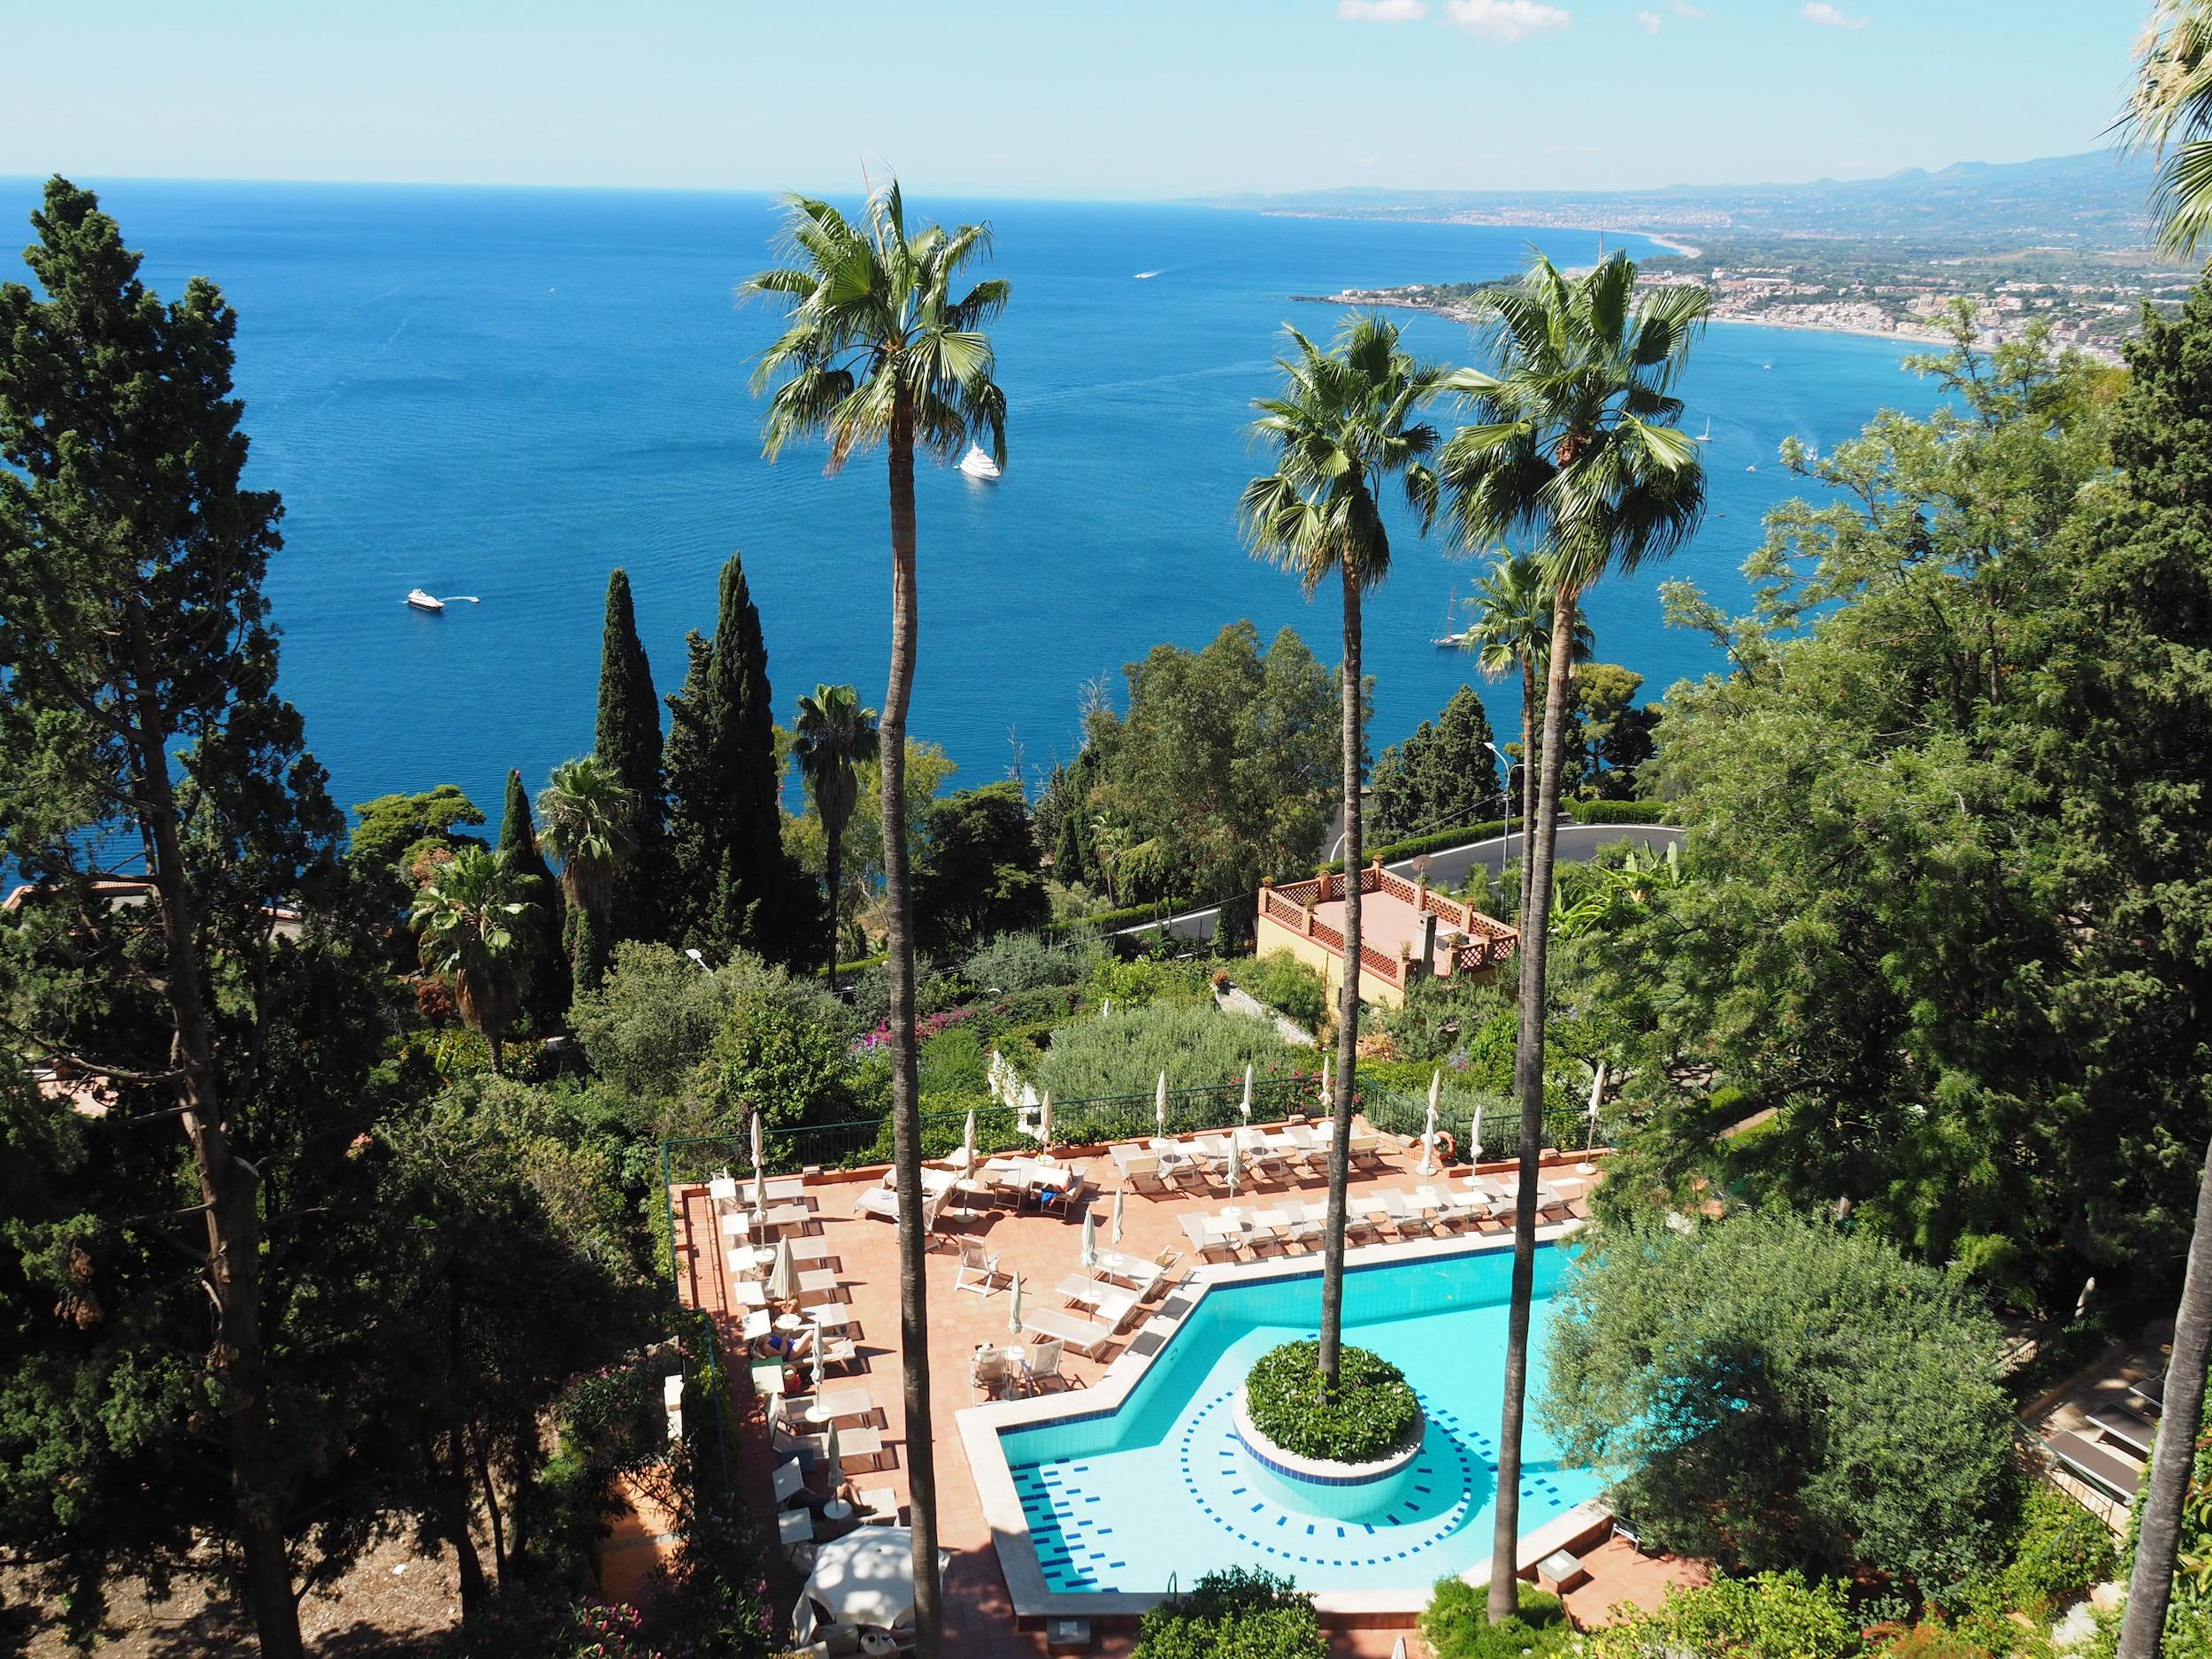 Villa Hotel Belvedere Taormina Travel Guide